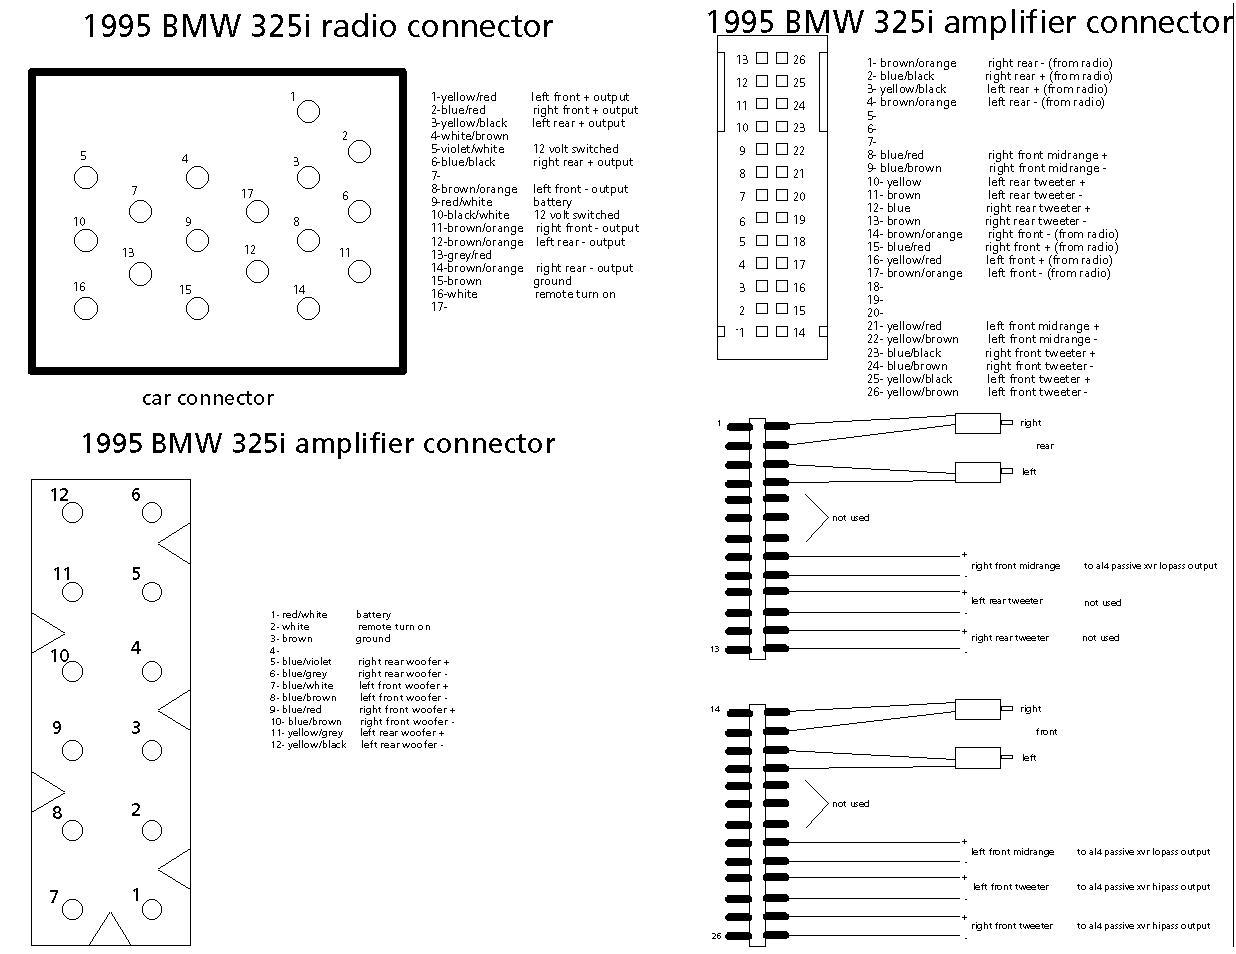 E34 Amplifier Hell